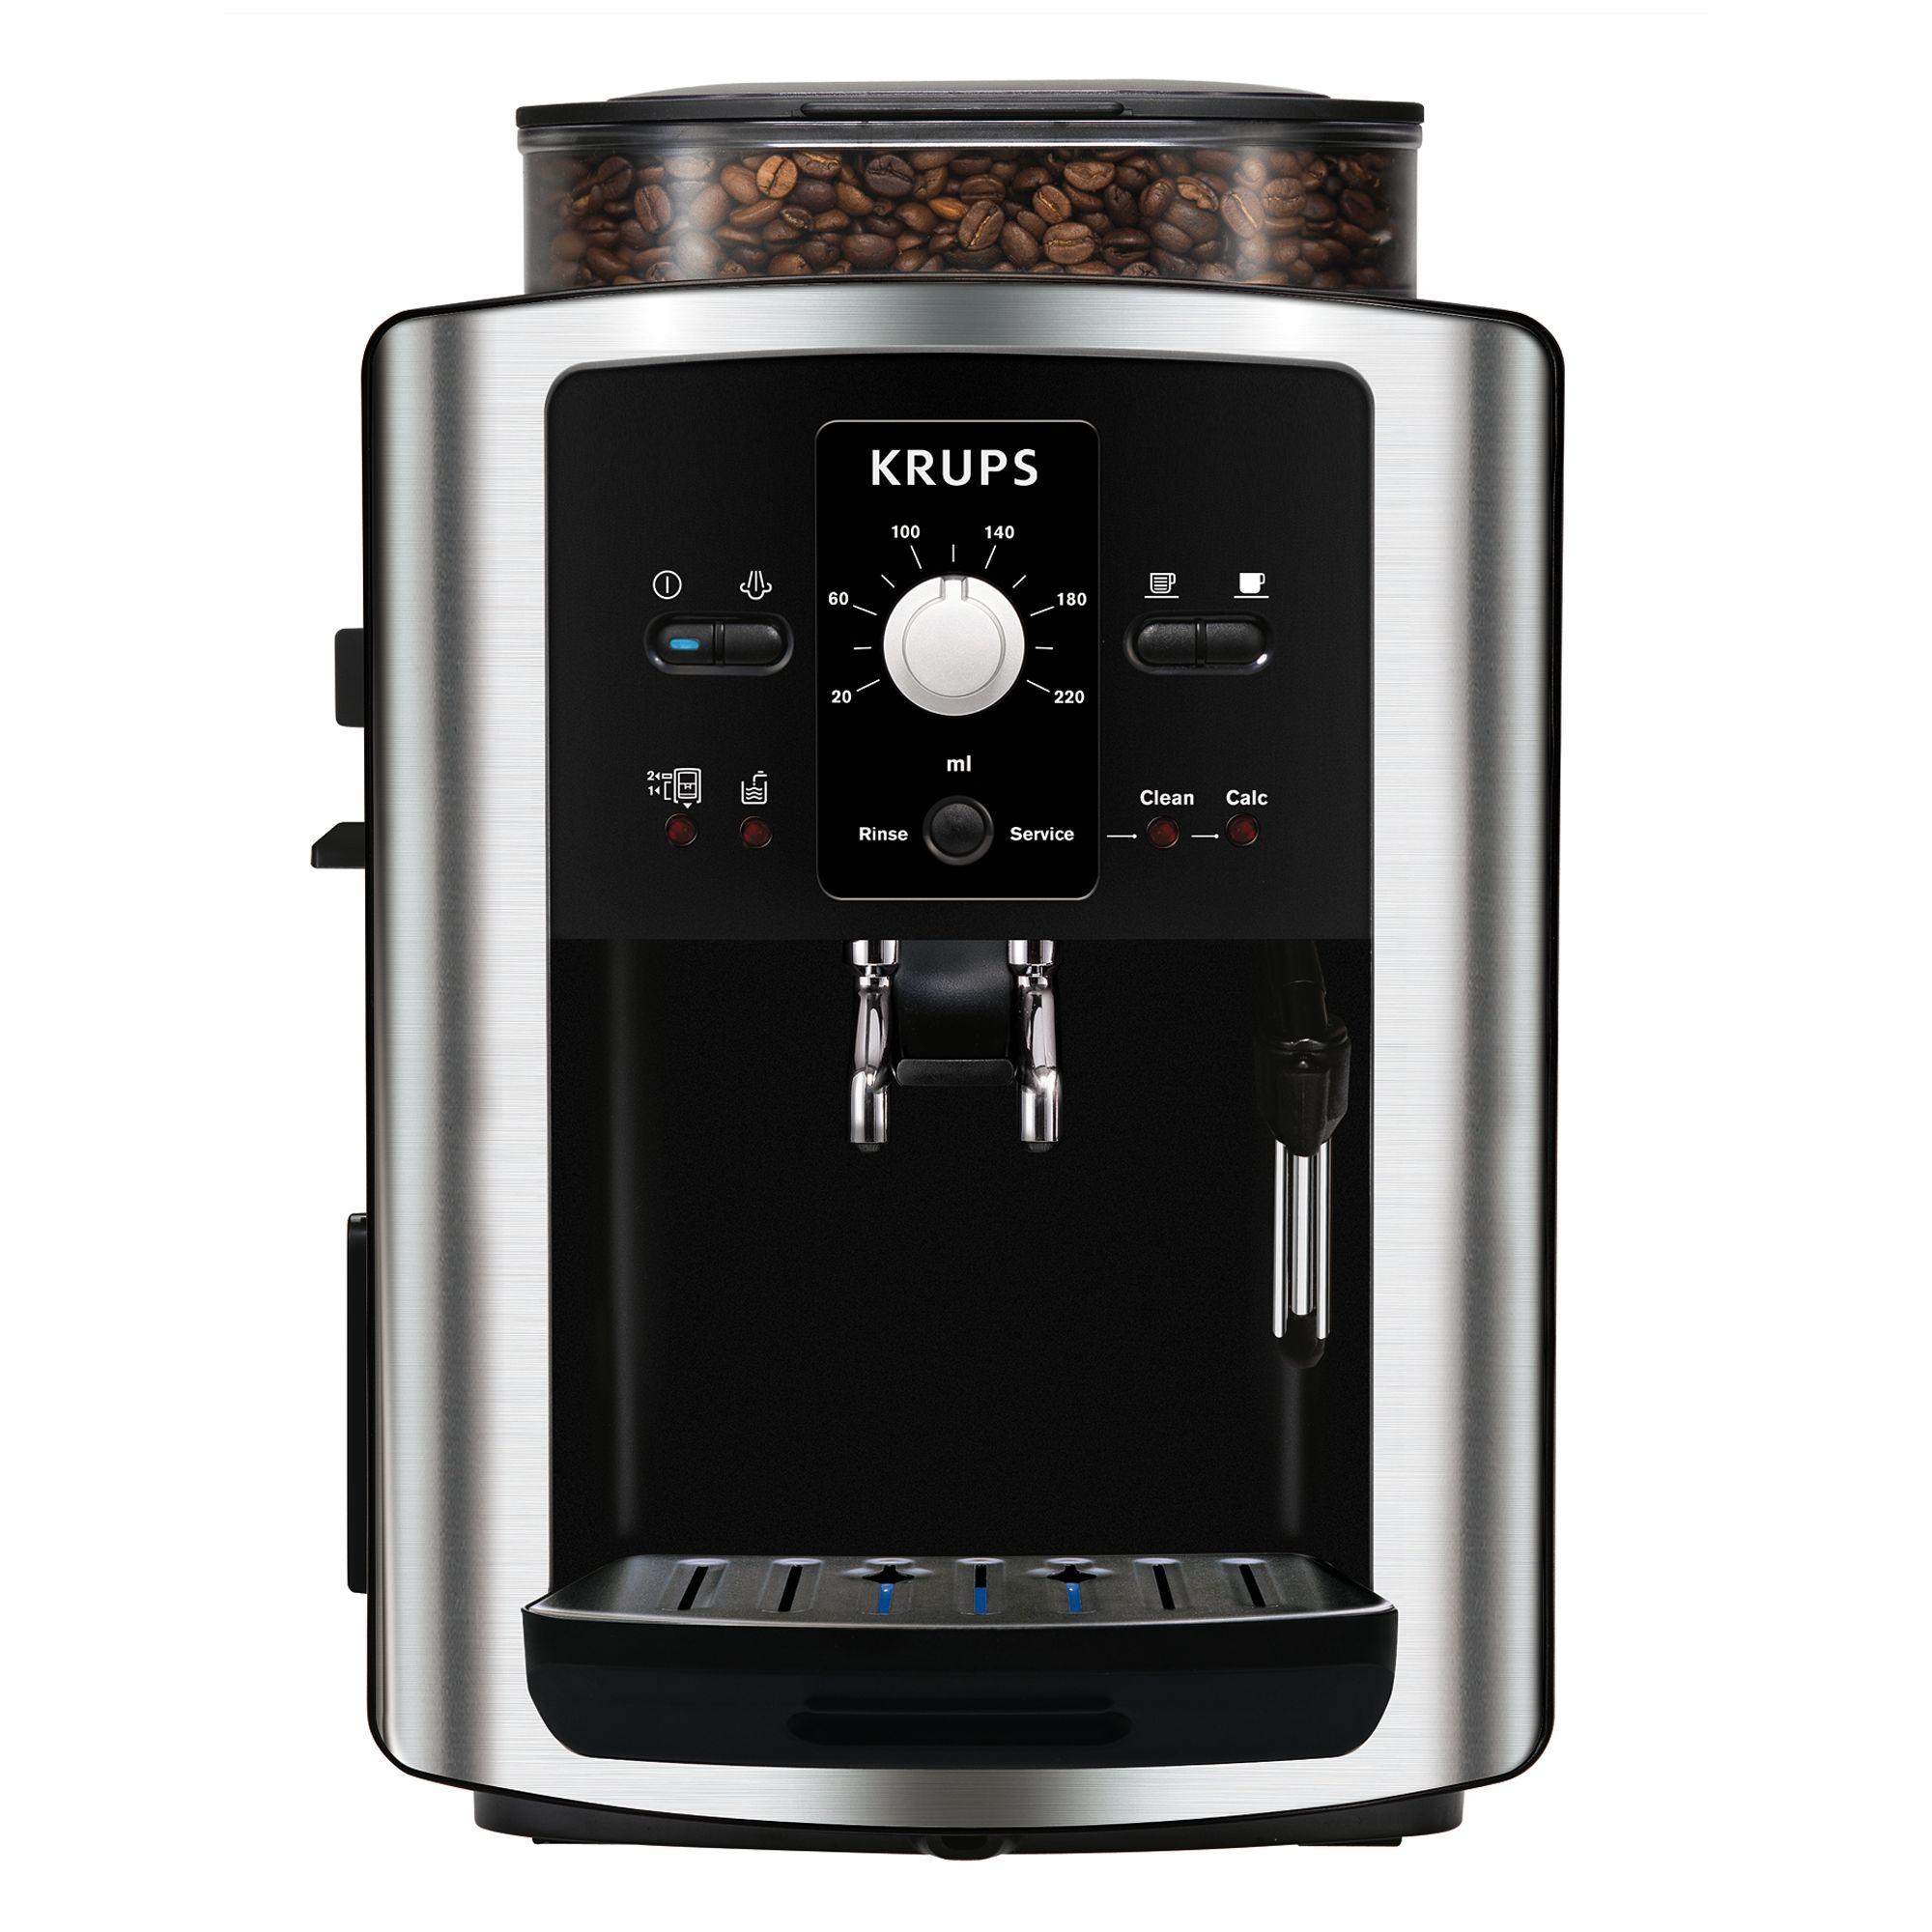 Krups KRUPS EA801040 Espresseria Bean-to-Cup Coffee Machine, Stainless Steel